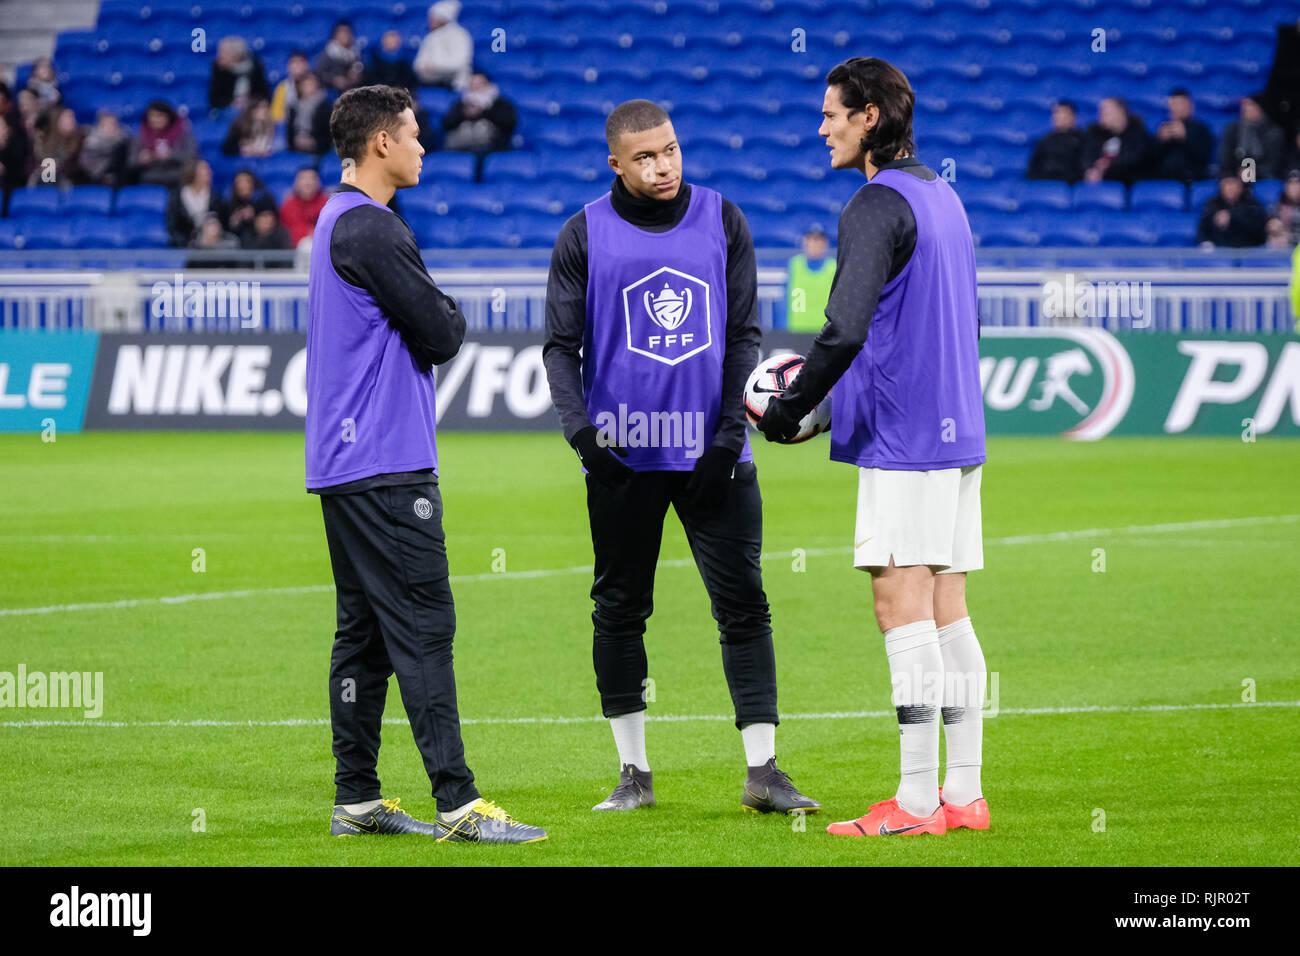 Thiago Silva, Kylian Mbappé and Edinson Cavani to warm up - Stock Image